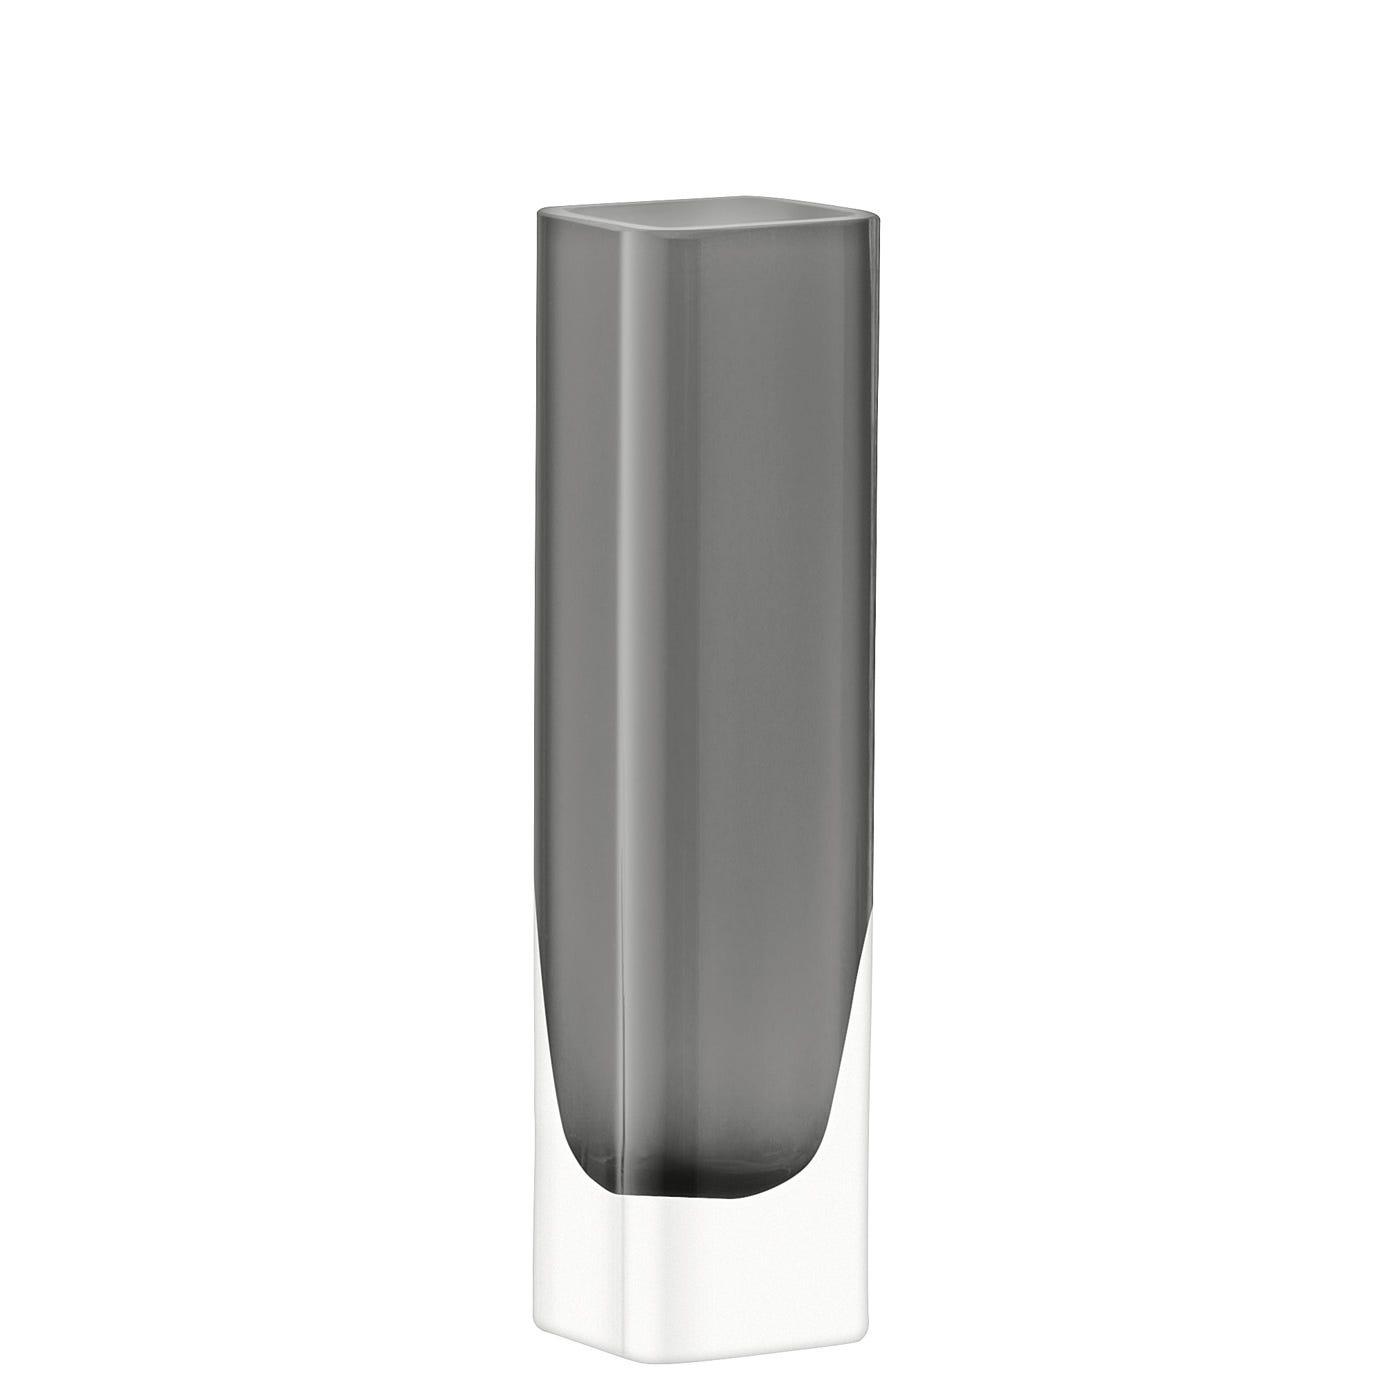 Modular Square Vase Slate Small